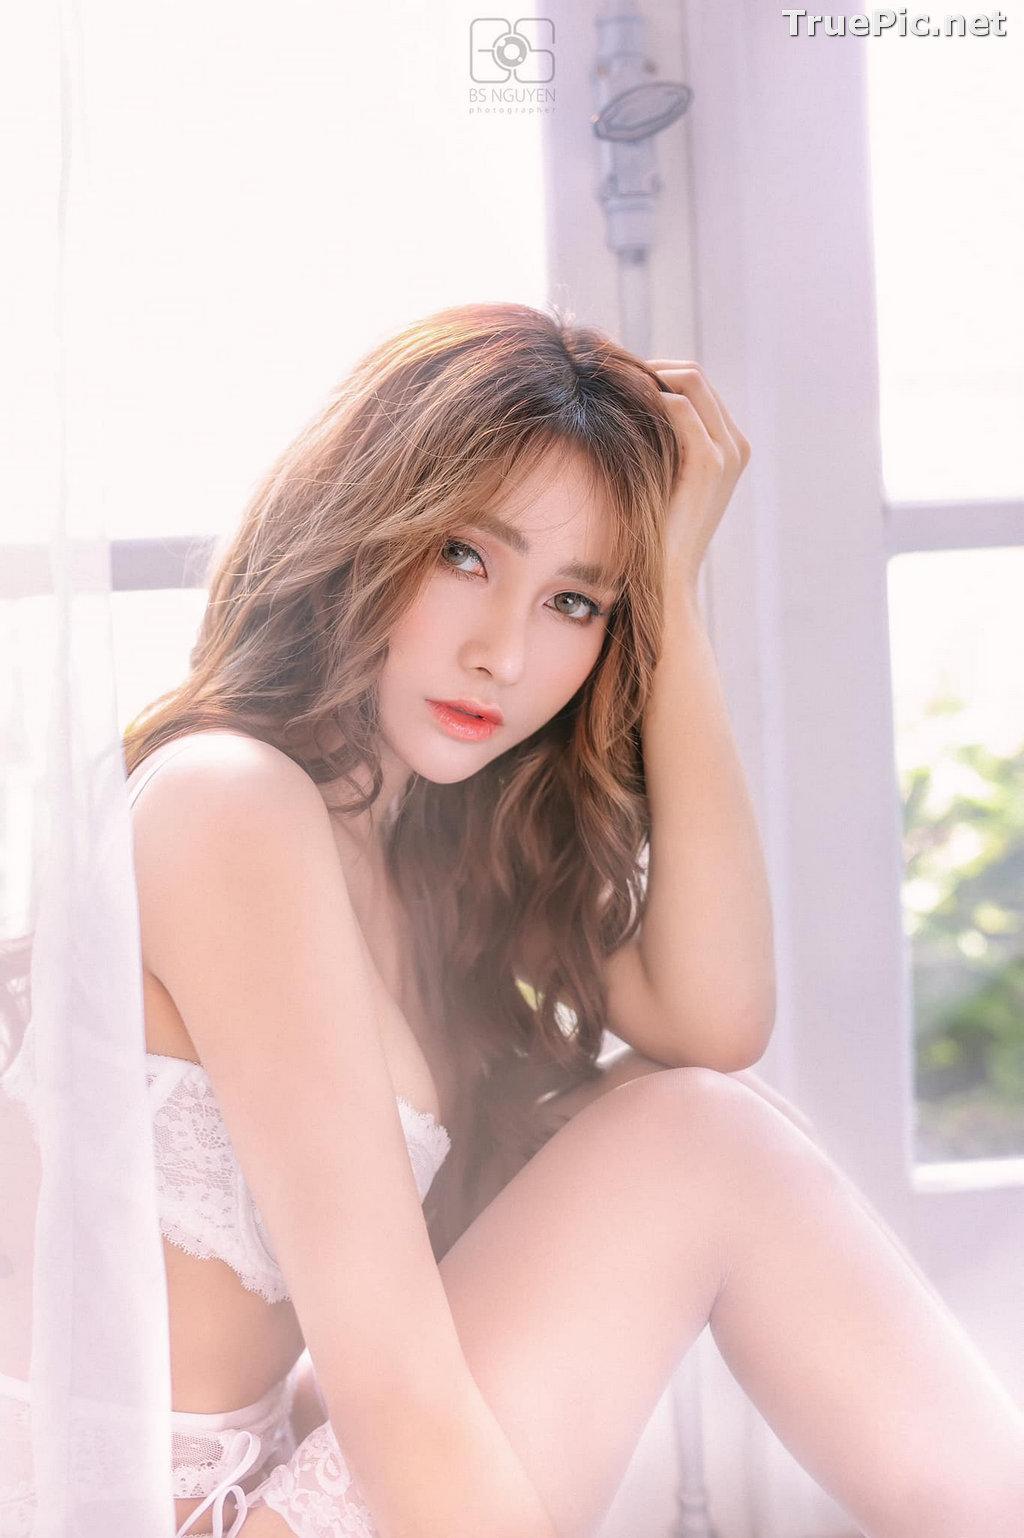 Image Vietnamese Model - Nguyen Thi Phi Yen - Beautiful Sexy White Lingerie - TruePic.net - Picture-3